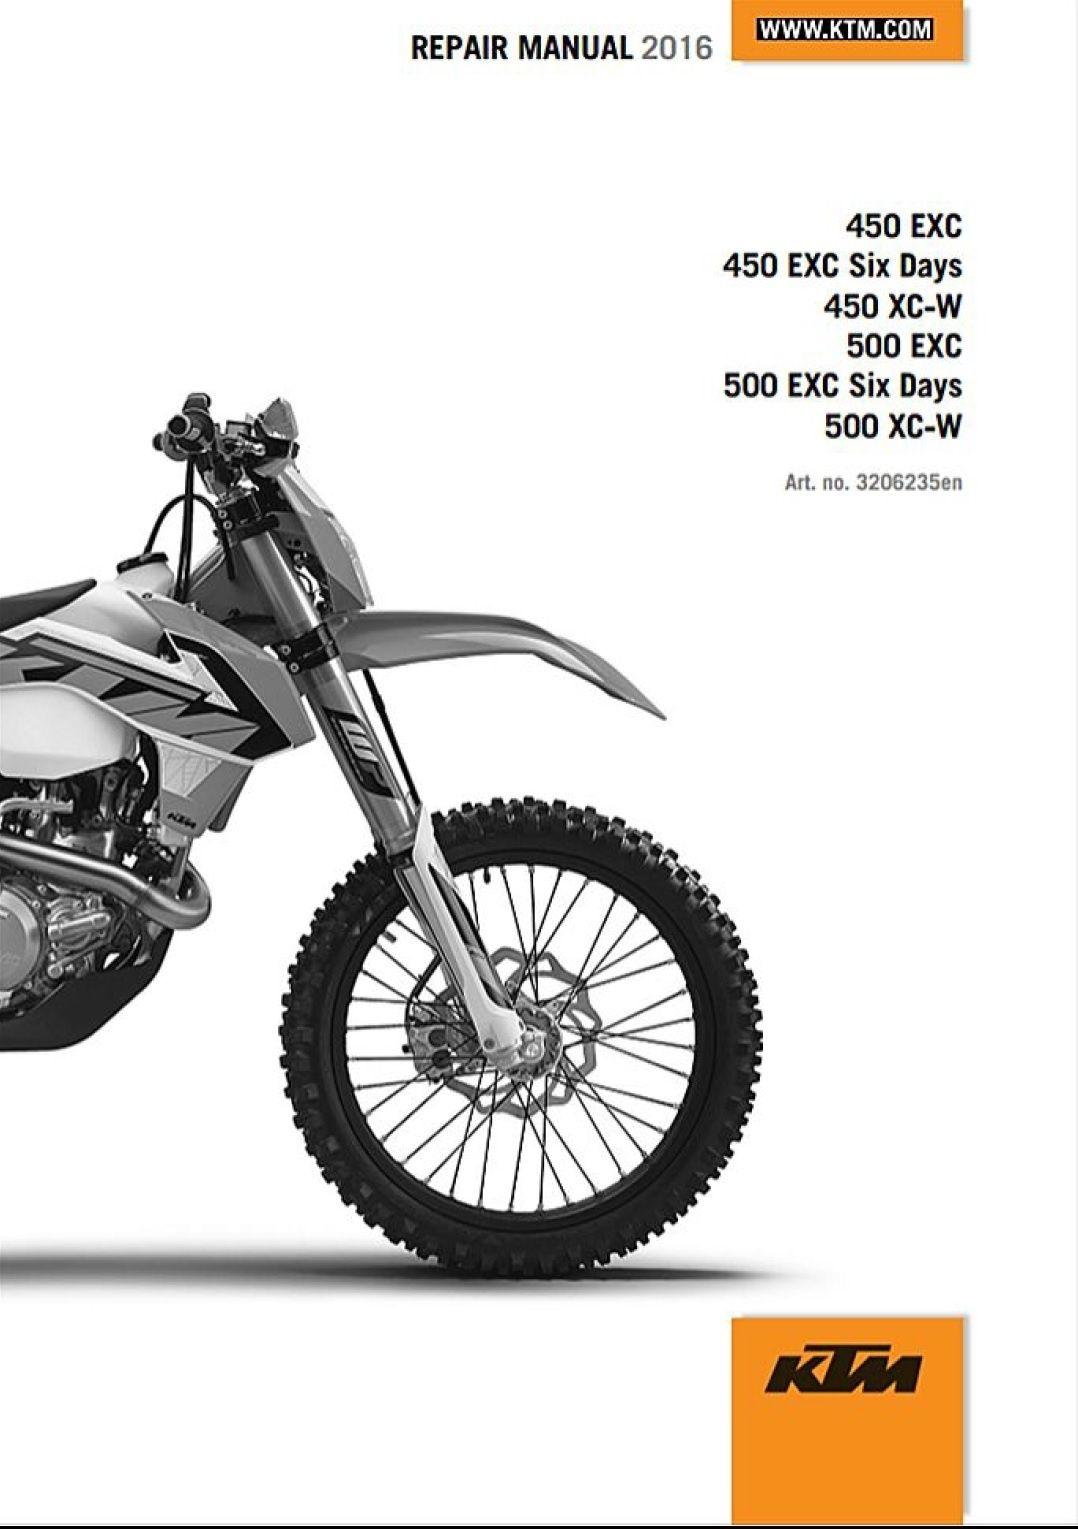 2016 ktm 450 500 exc xc w 6days service repair manual  [ 1078 x 1529 Pixel ]